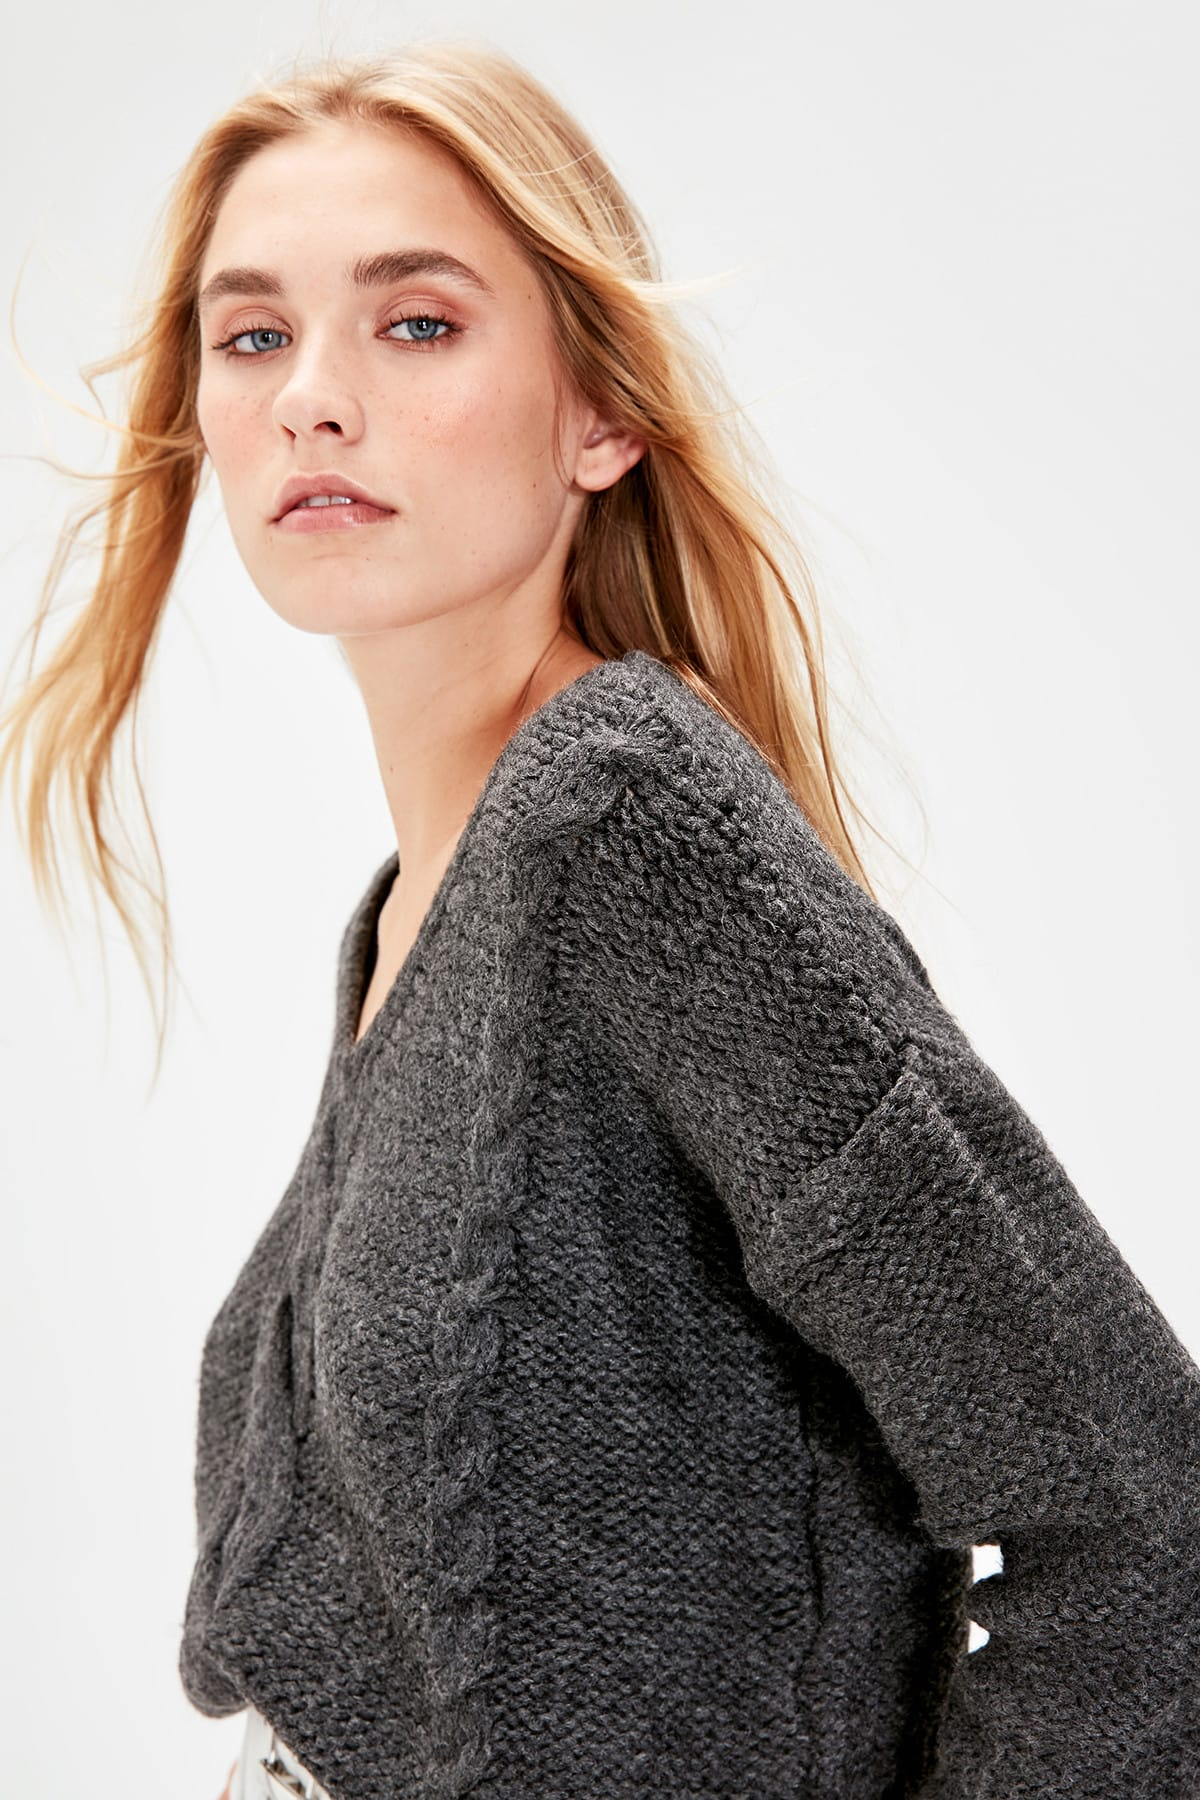 Trendyol Anthracite V Collar Hair Braided Knitwear Sweater TWOAW20KZ0528